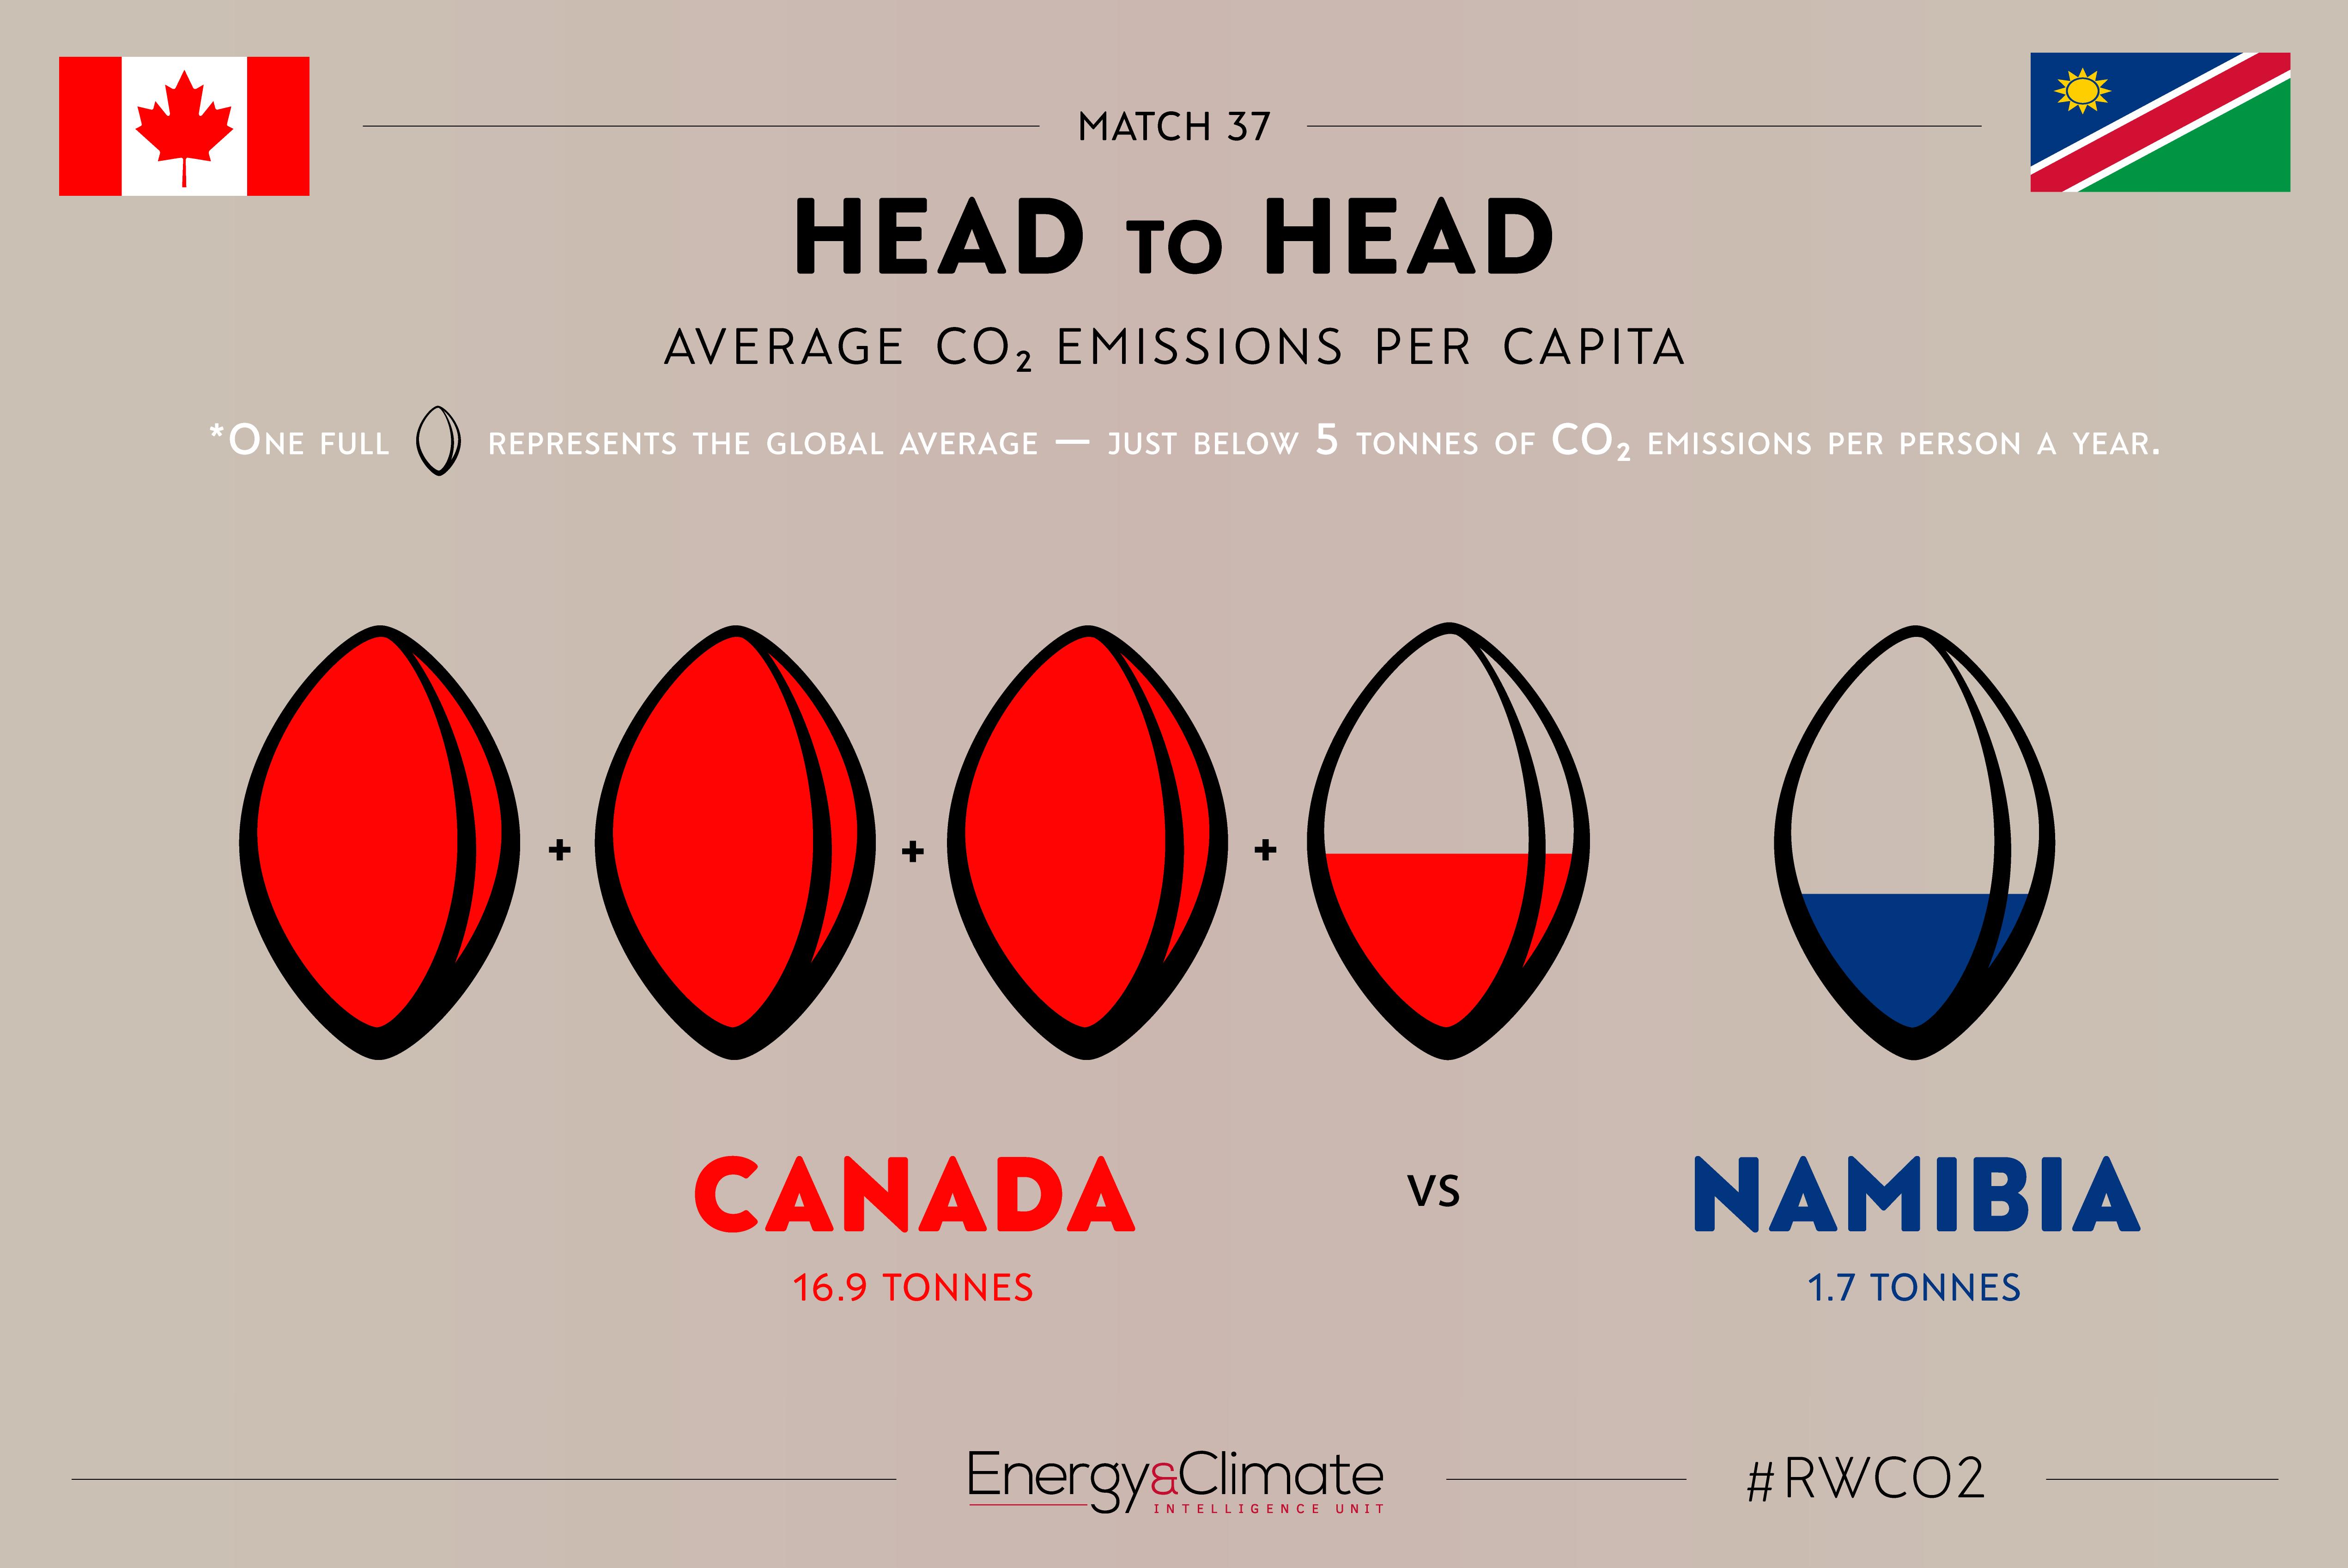 Canada v Namibia - per capita emissions